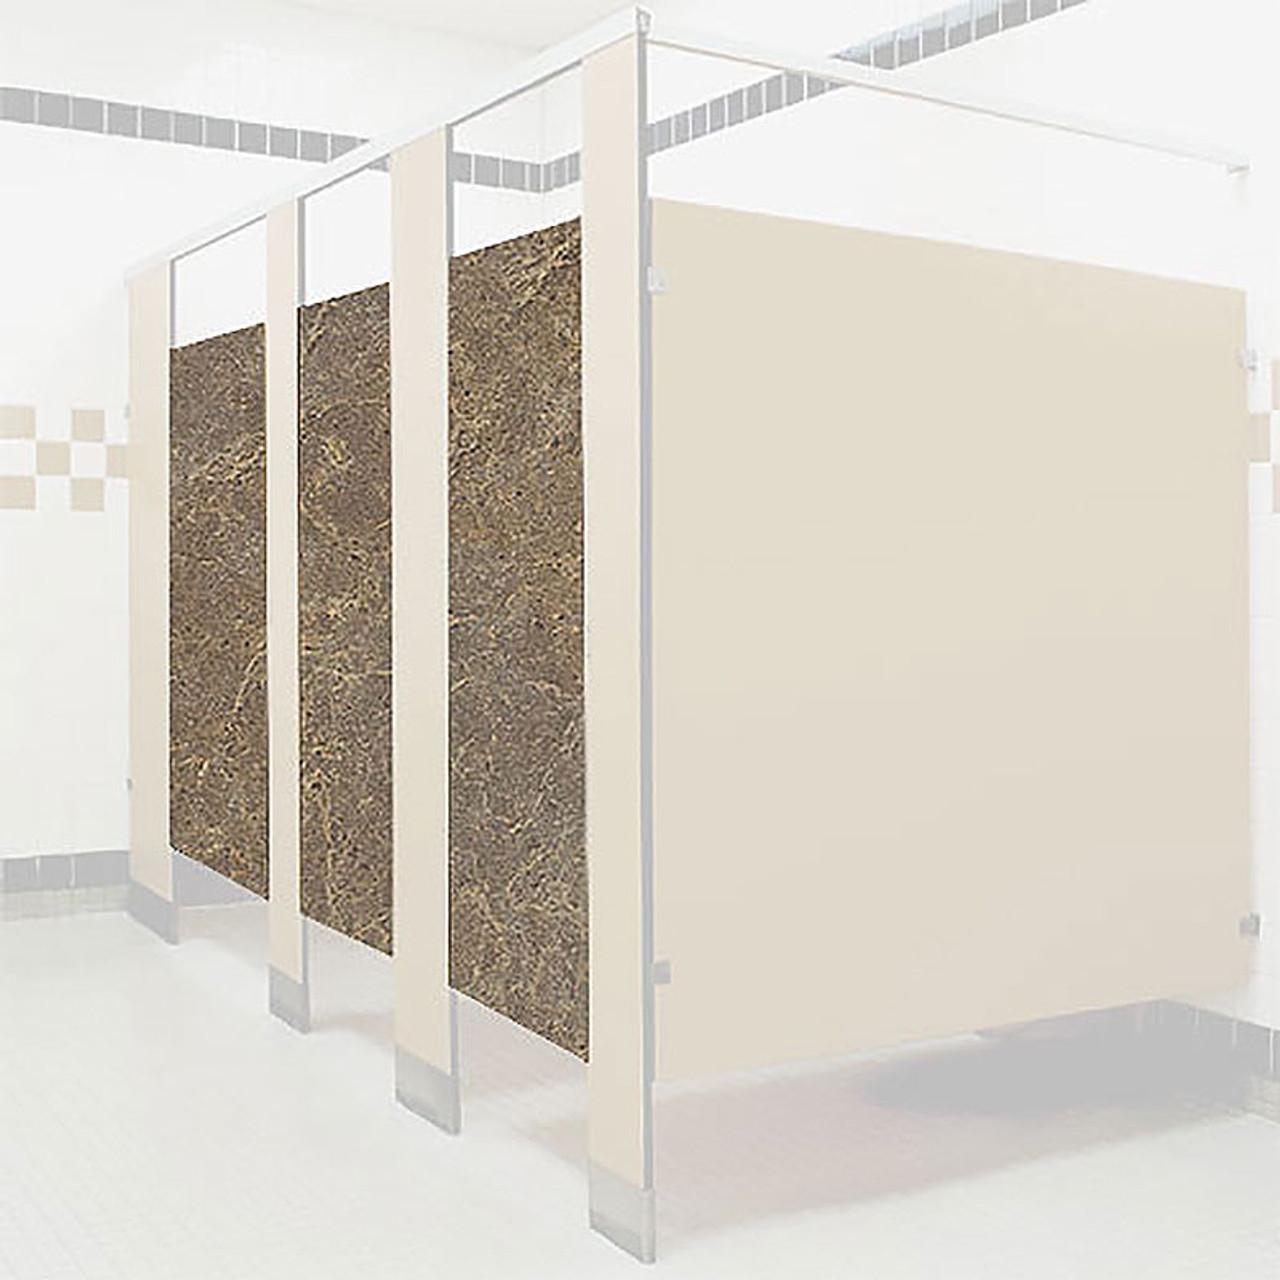 Solid Phenolic Toilet Compartment Door ... & Solid Phenolic Toilet Compartment Door - Harbor City Supply